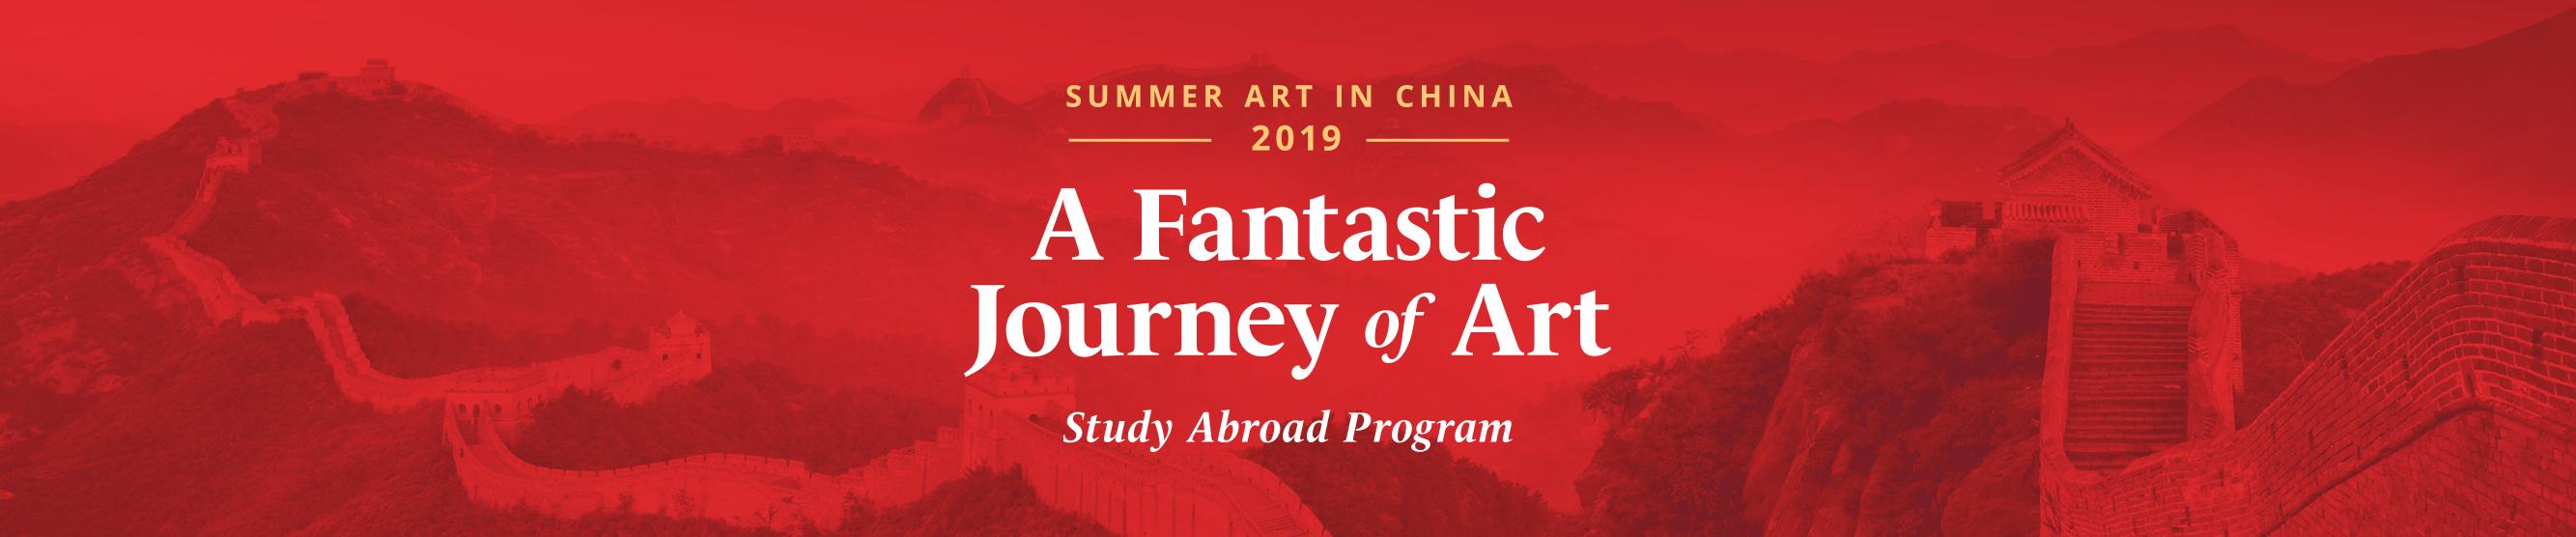 Summer Art in China 2019